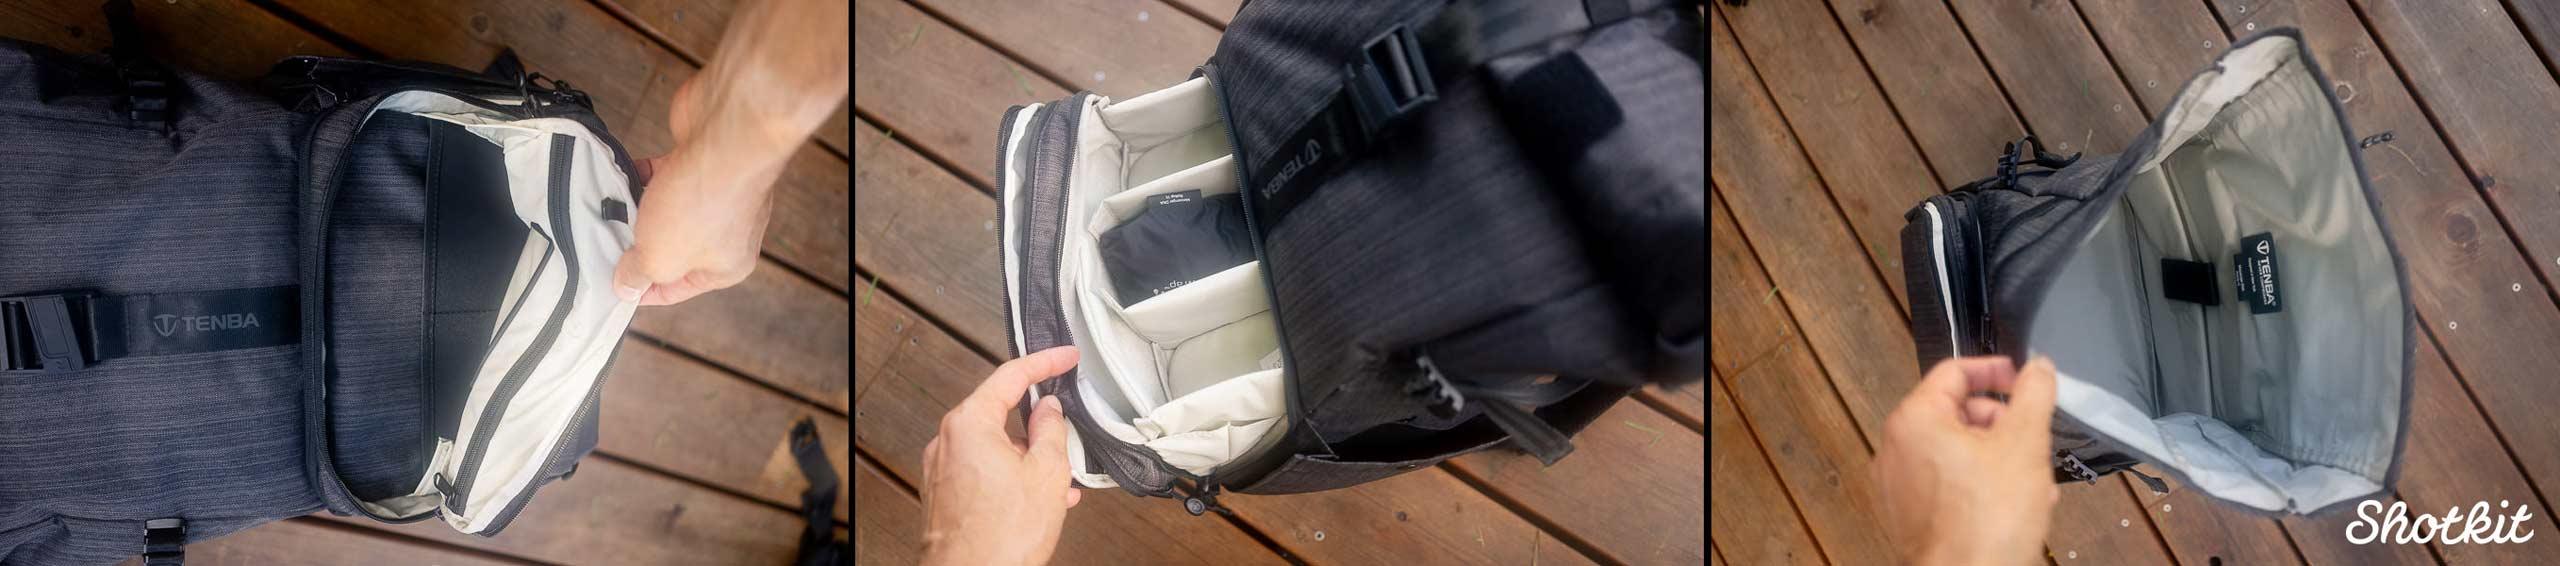 000b358238 Best Camera Backpacks in 2019 + Lowepro Hiking Camera Bag Options